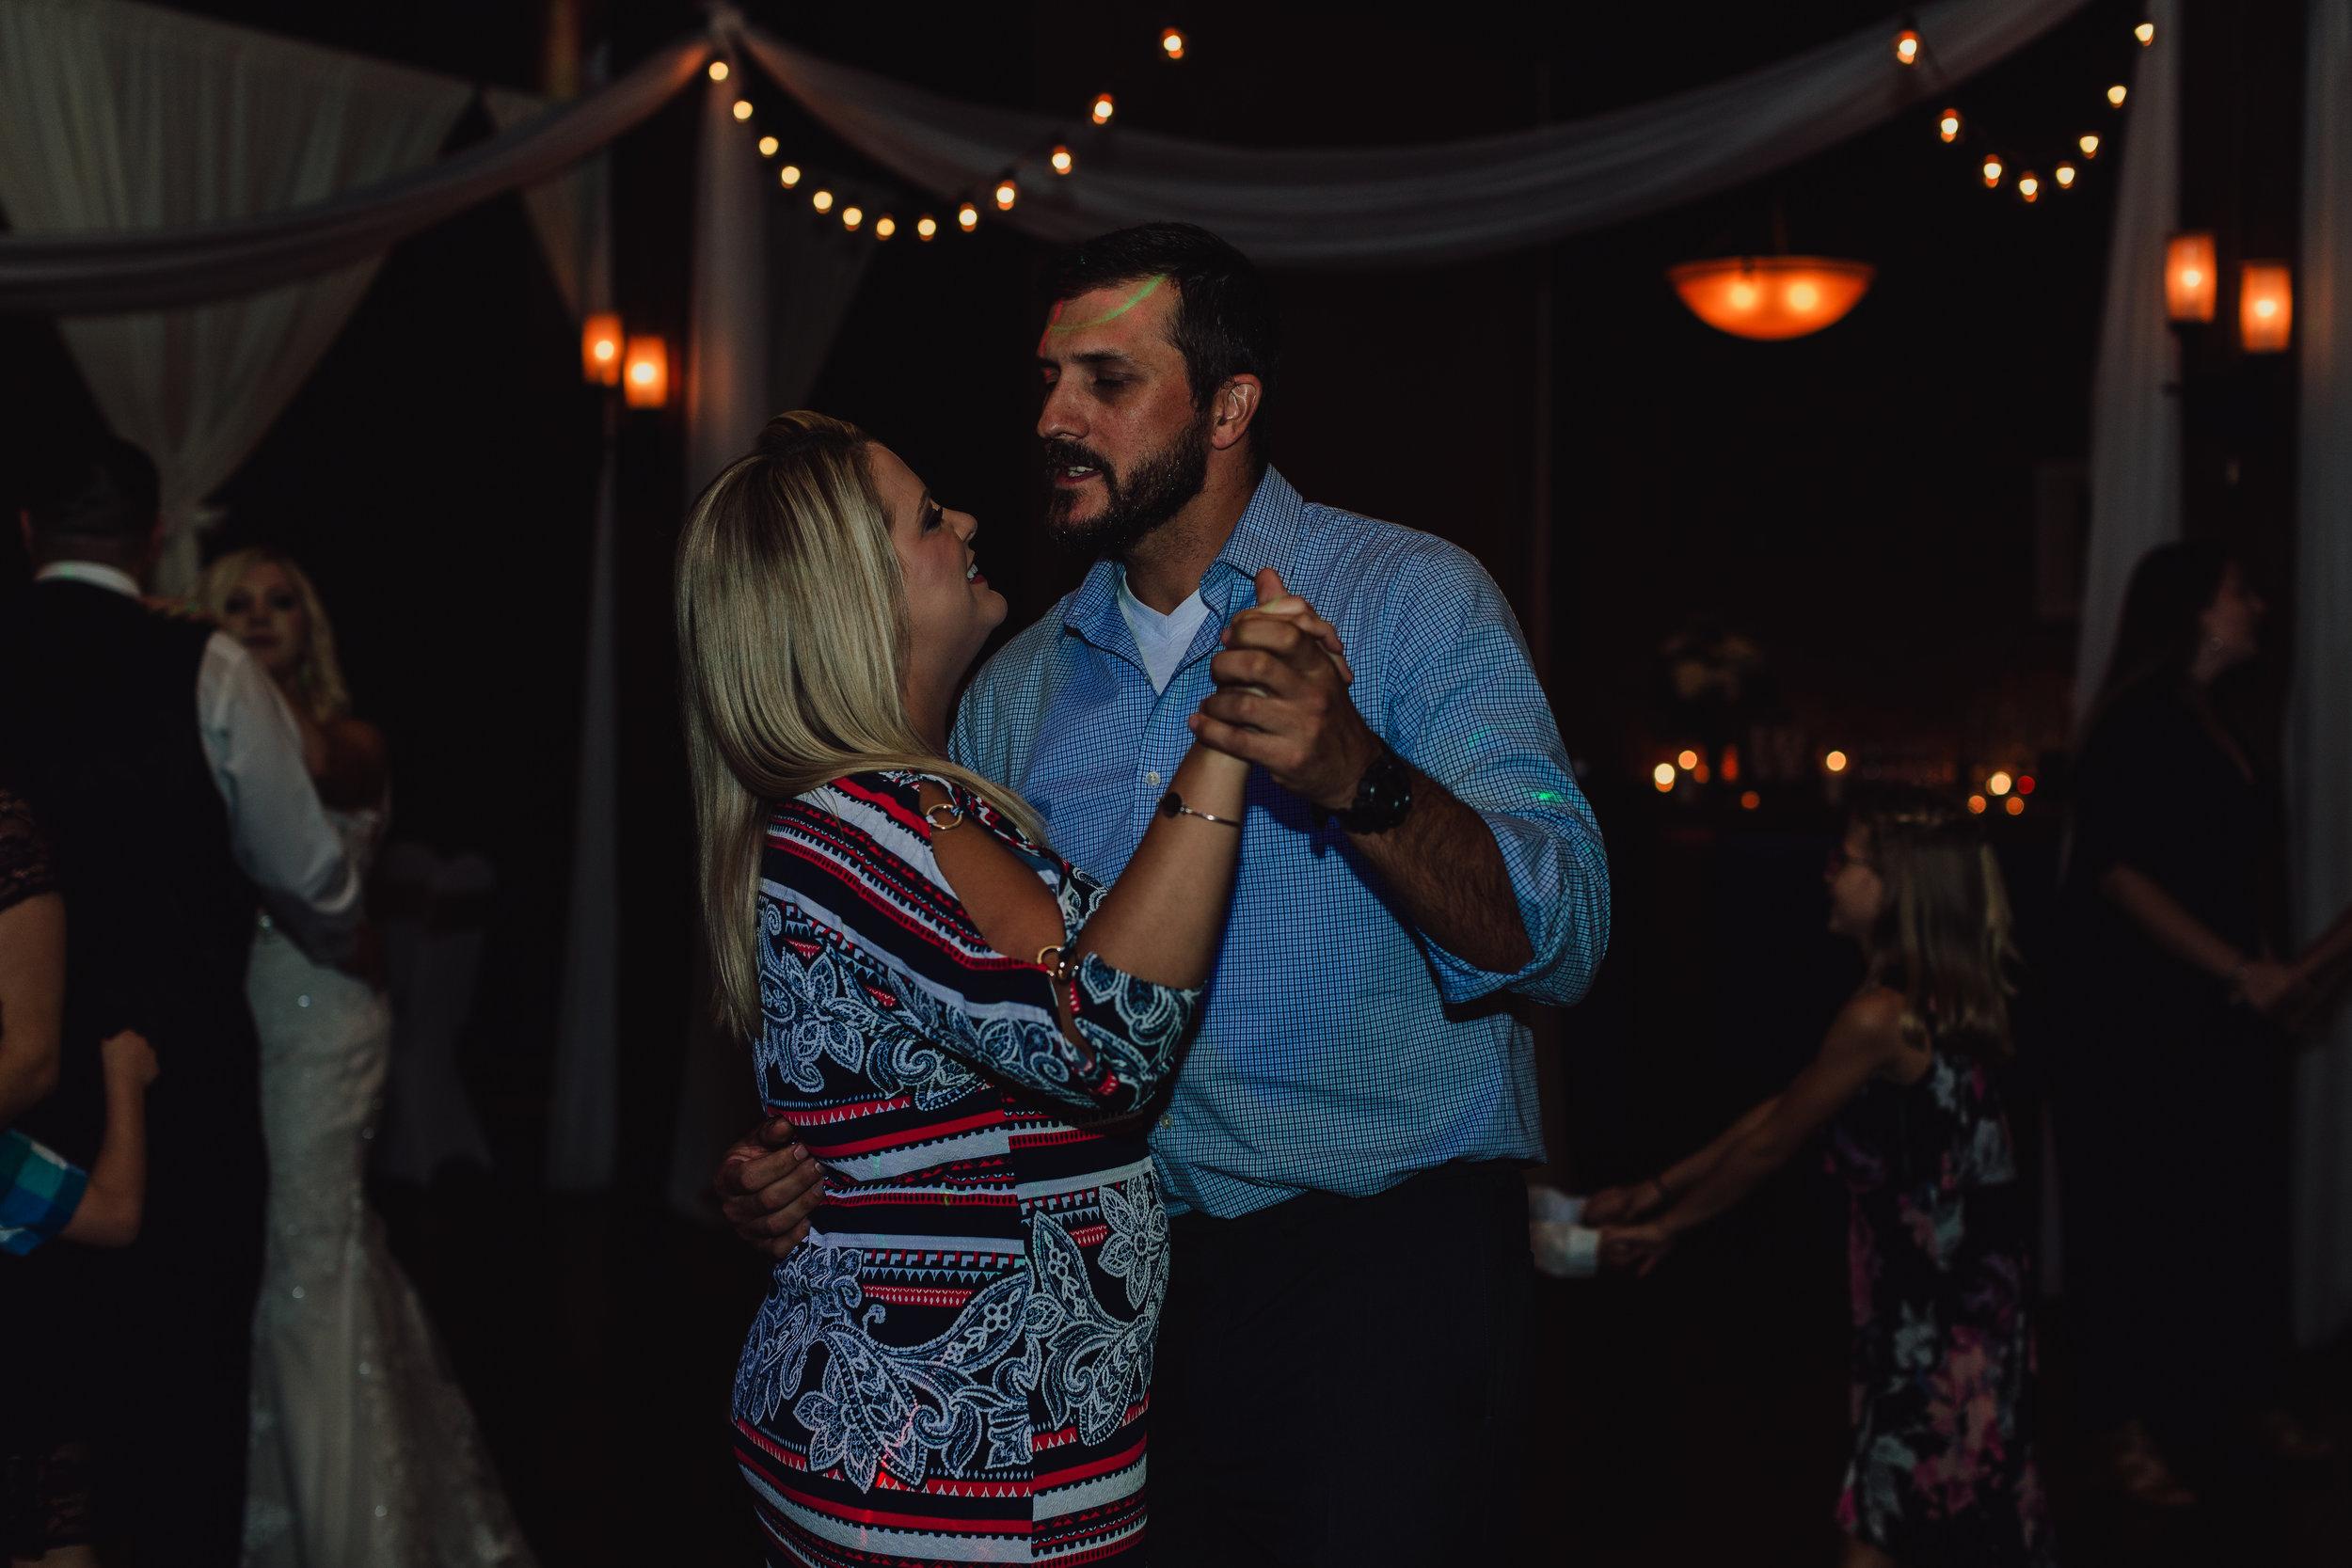 east-tn-wedding-photographer-tennessee-elopement-photographer-kingsport-tn-wedding-photographer (969 of 1001).jpg